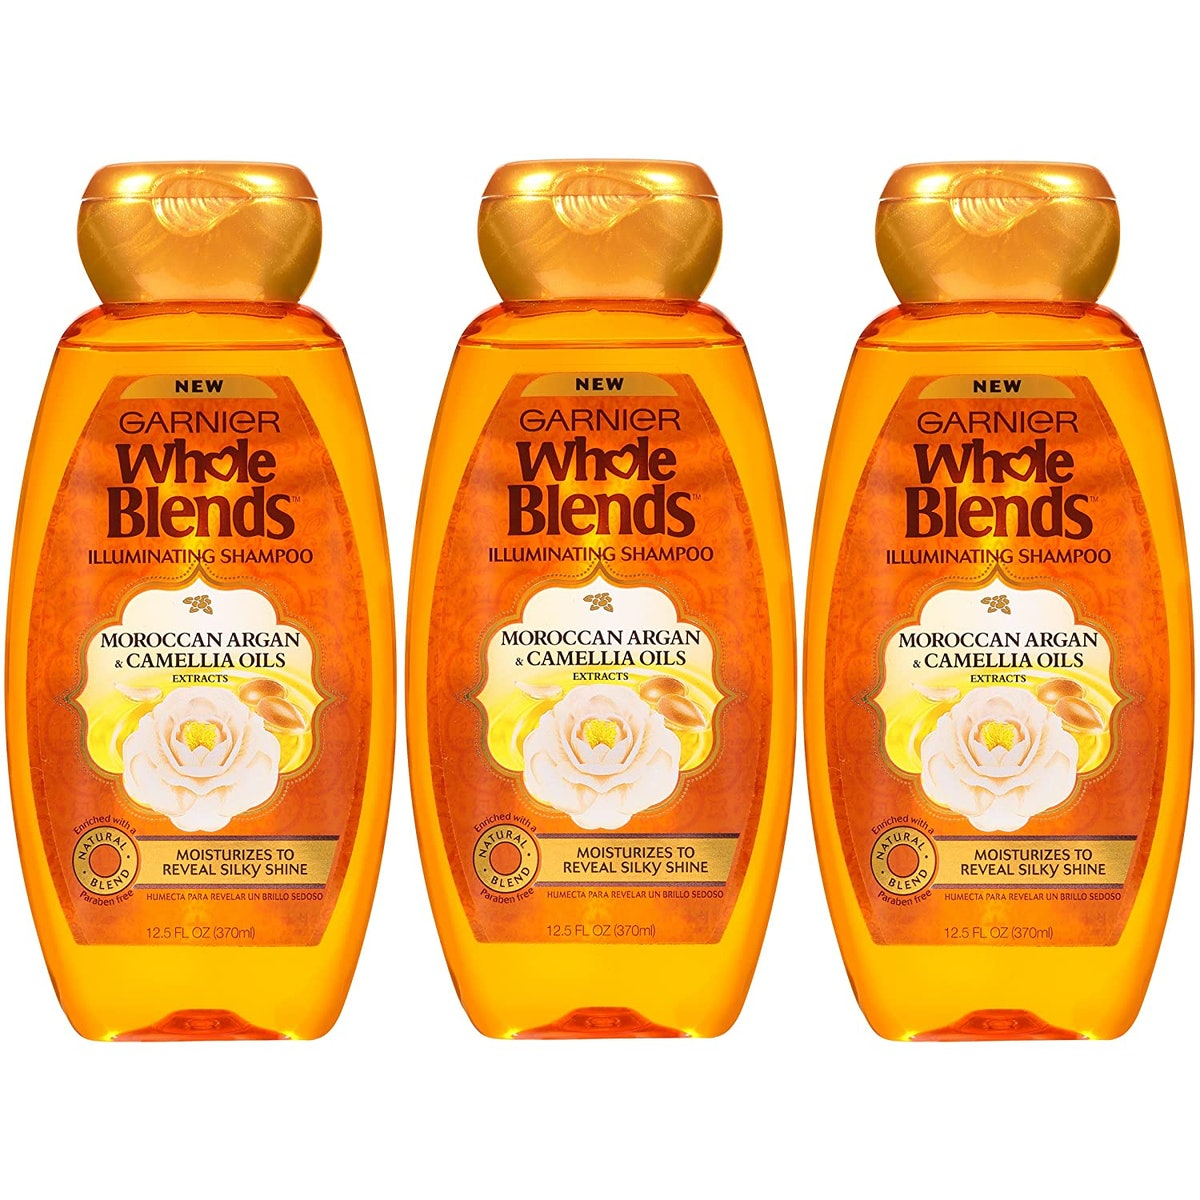 Garnier Whole Blends Illuminating Shampoo (3-Pack)